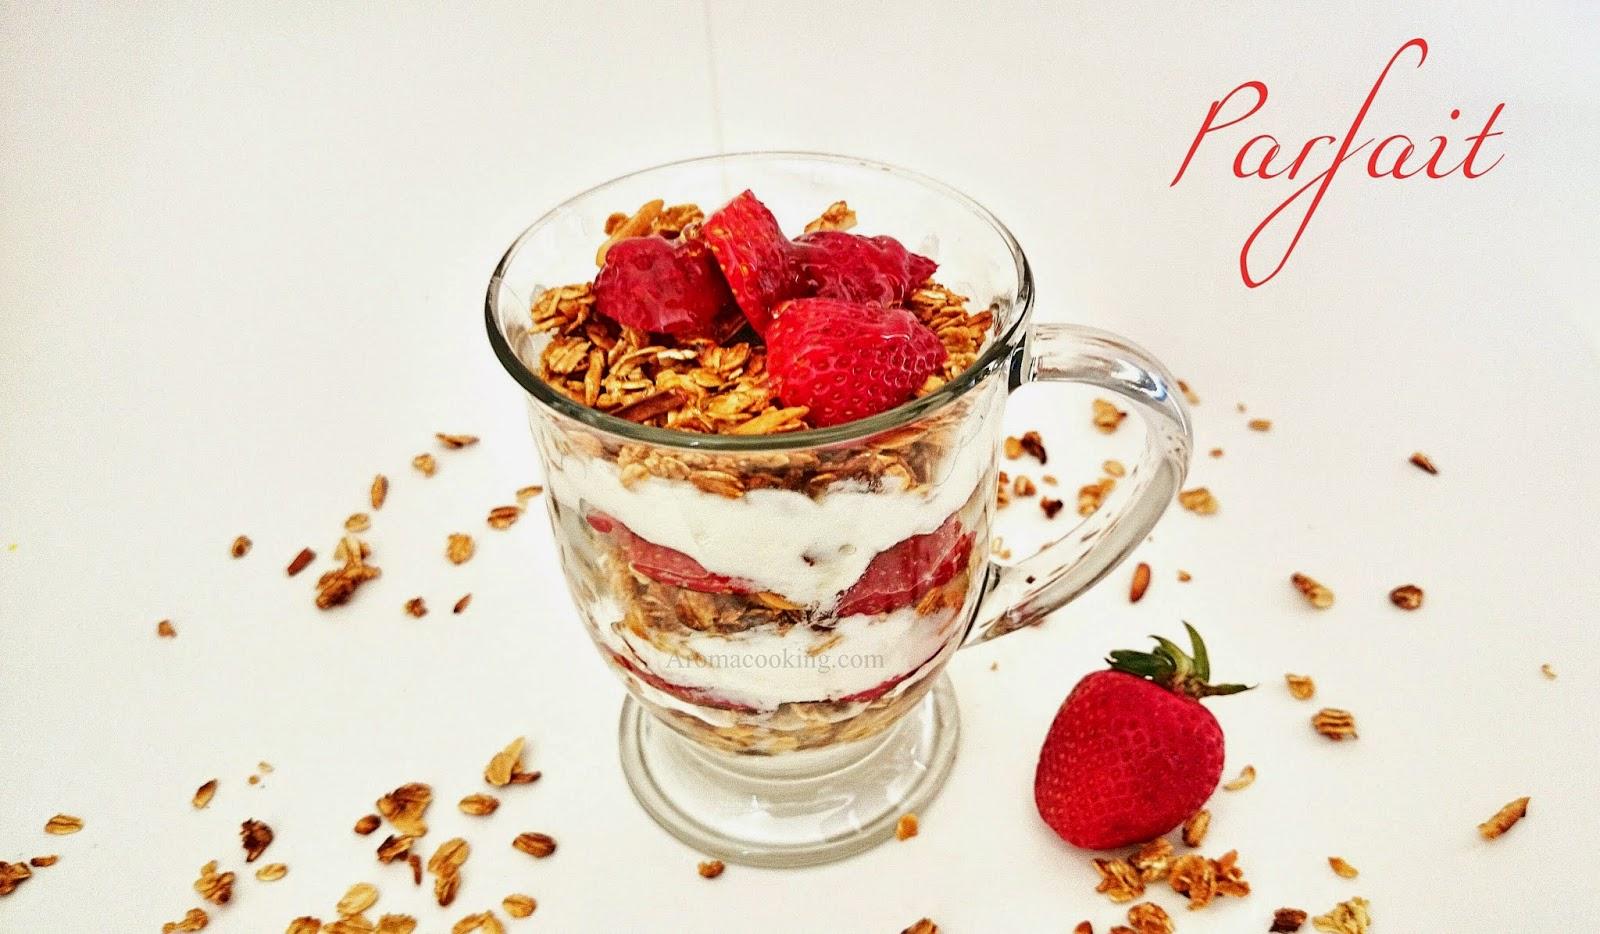 Strawberry Granola Prafait